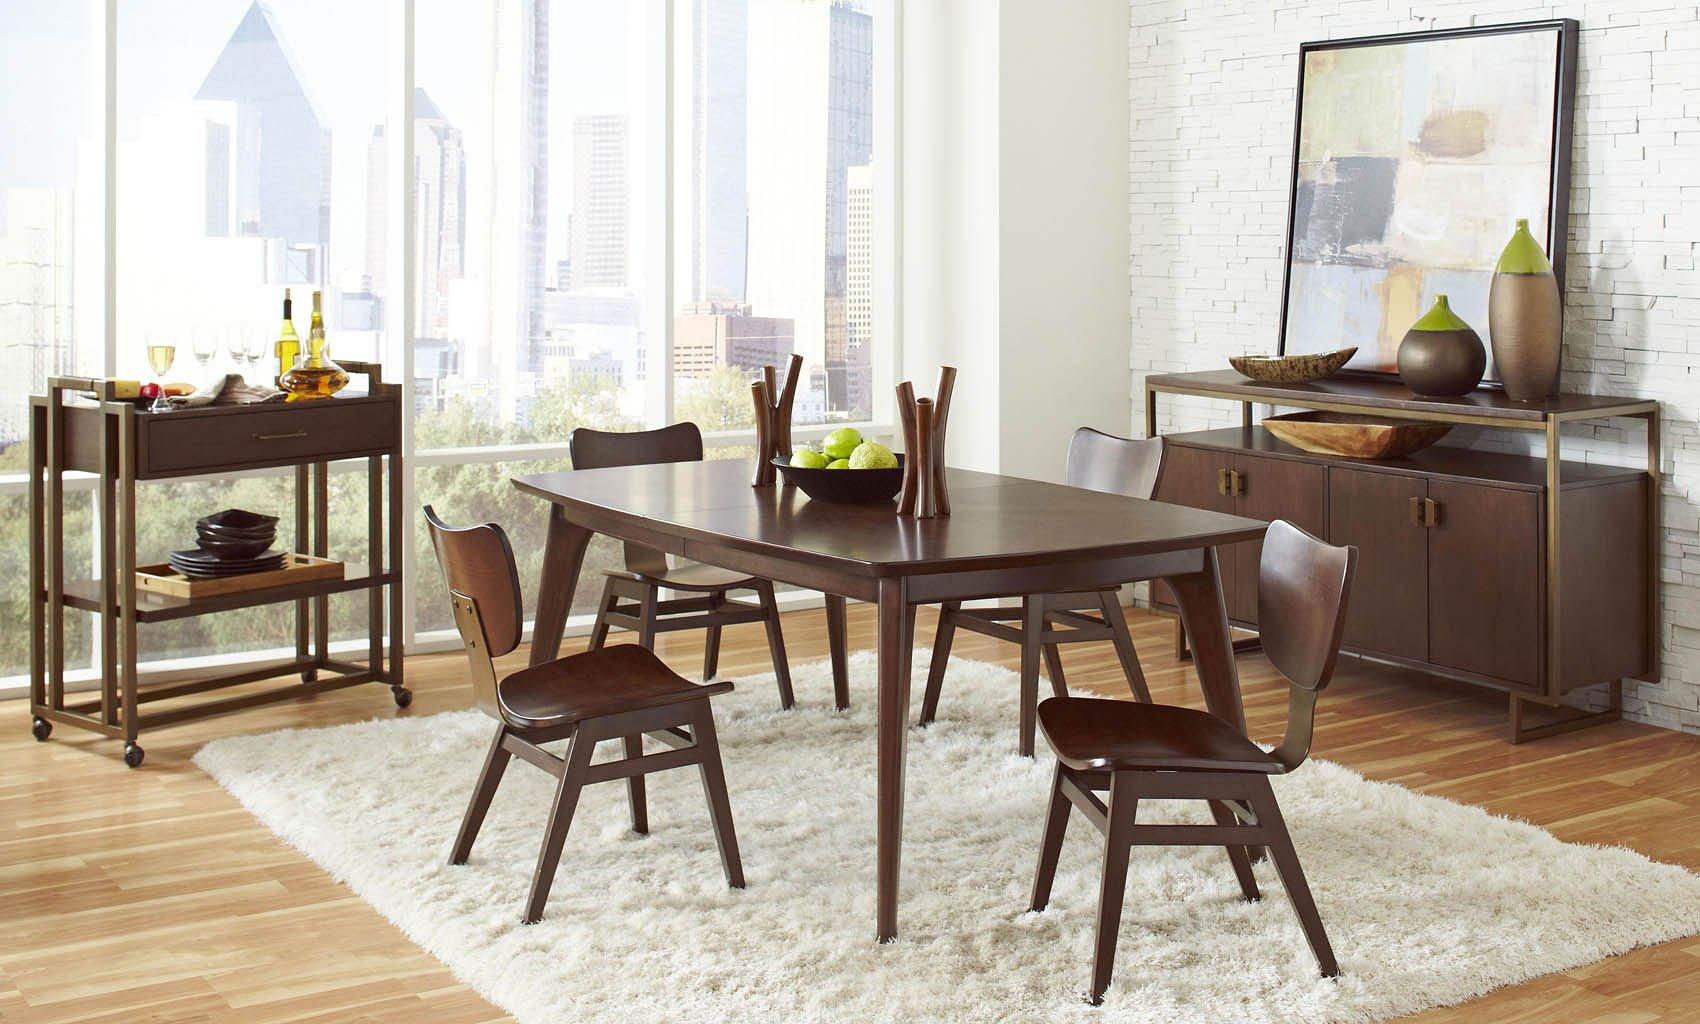 pulaski furniture dining room set | Modern Harmony Dining Room Set Pulaski Furniture ...